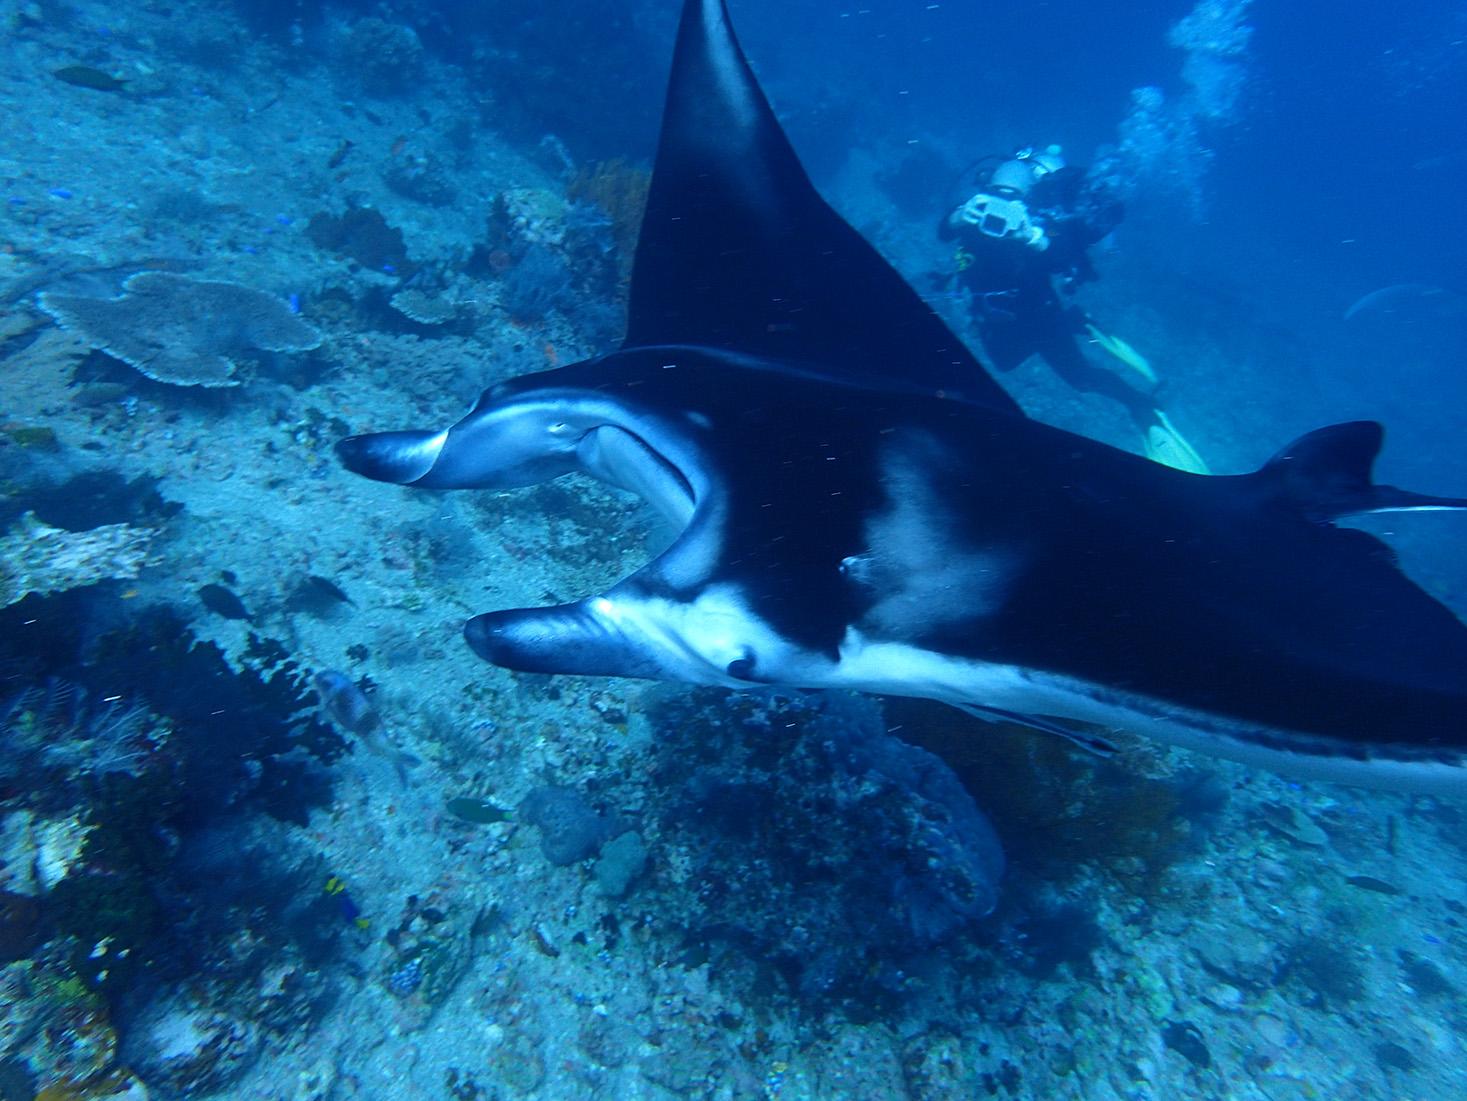 Manta Ray Komodo 2015 by Rachel McLellan